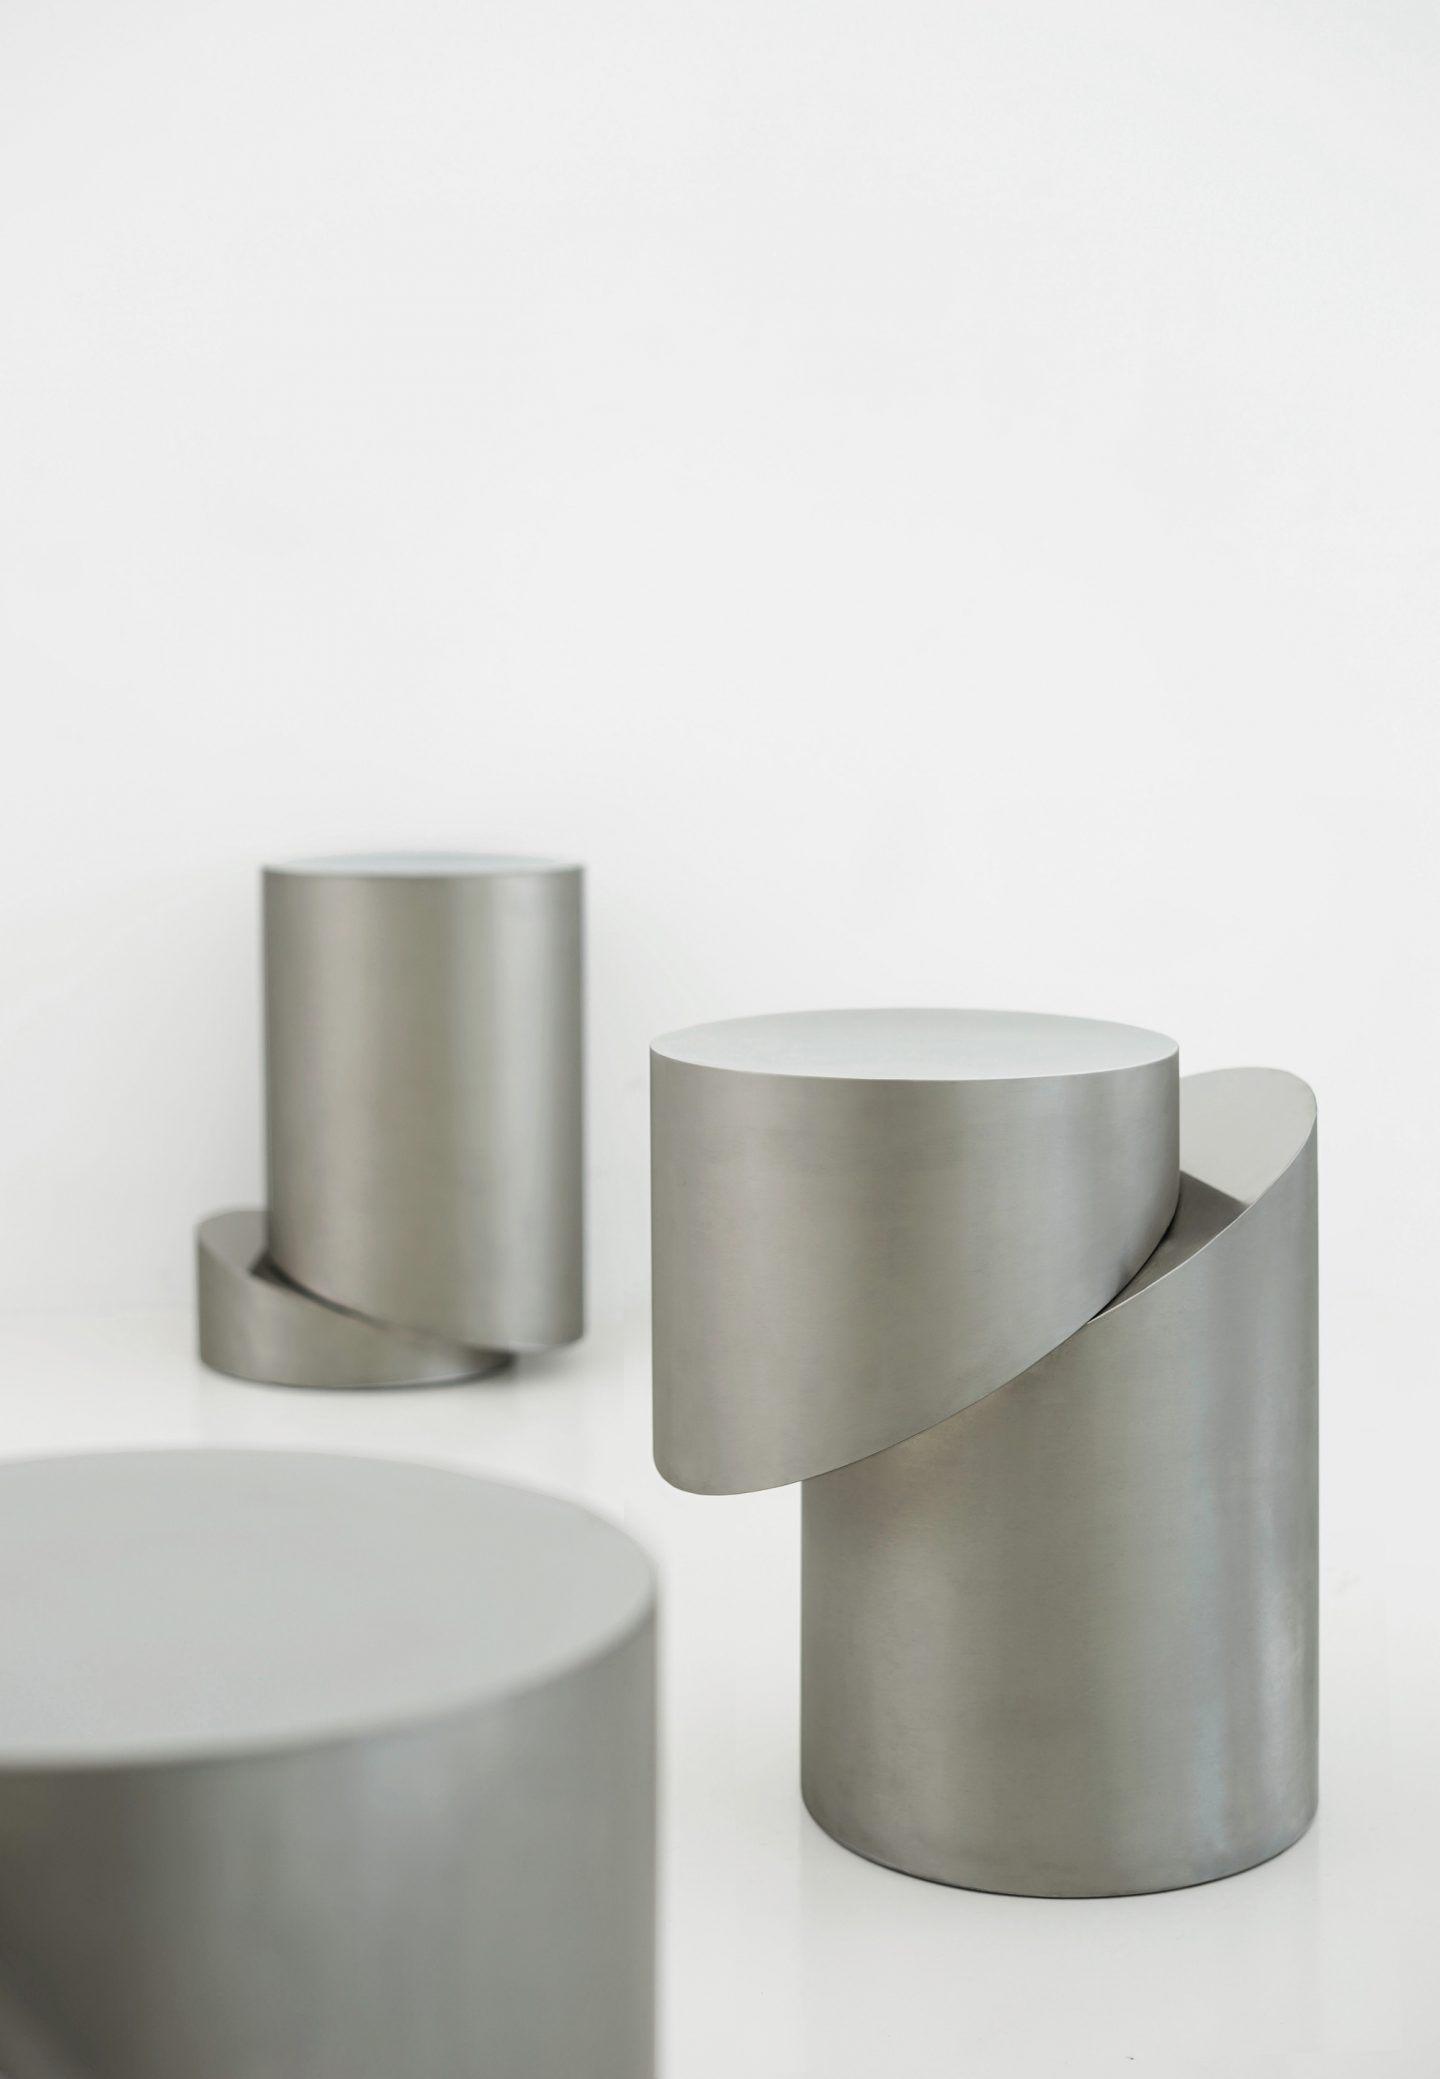 IGNANT-Design-Jeong-Ho-Ko-Hyongho-Park-Slice-Series-5